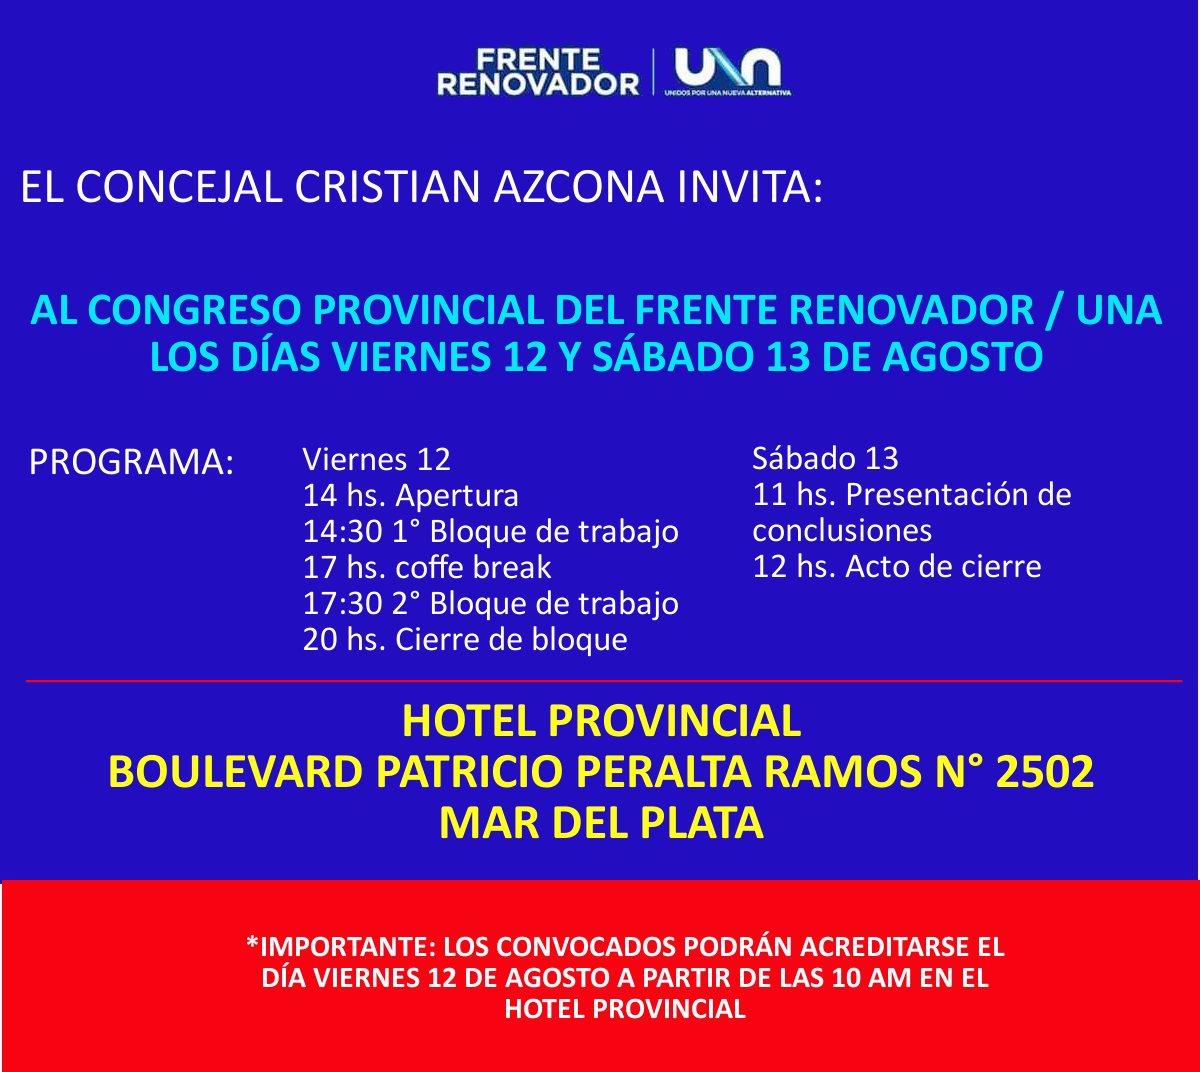 CONGRESO #FRENTERENOVADOR #UNA @cristian_azcona @SergioMassa @MassaPrensa @frenterenovador @MalenaMassa<br>http://pic.twitter.com/04phG5mRzs